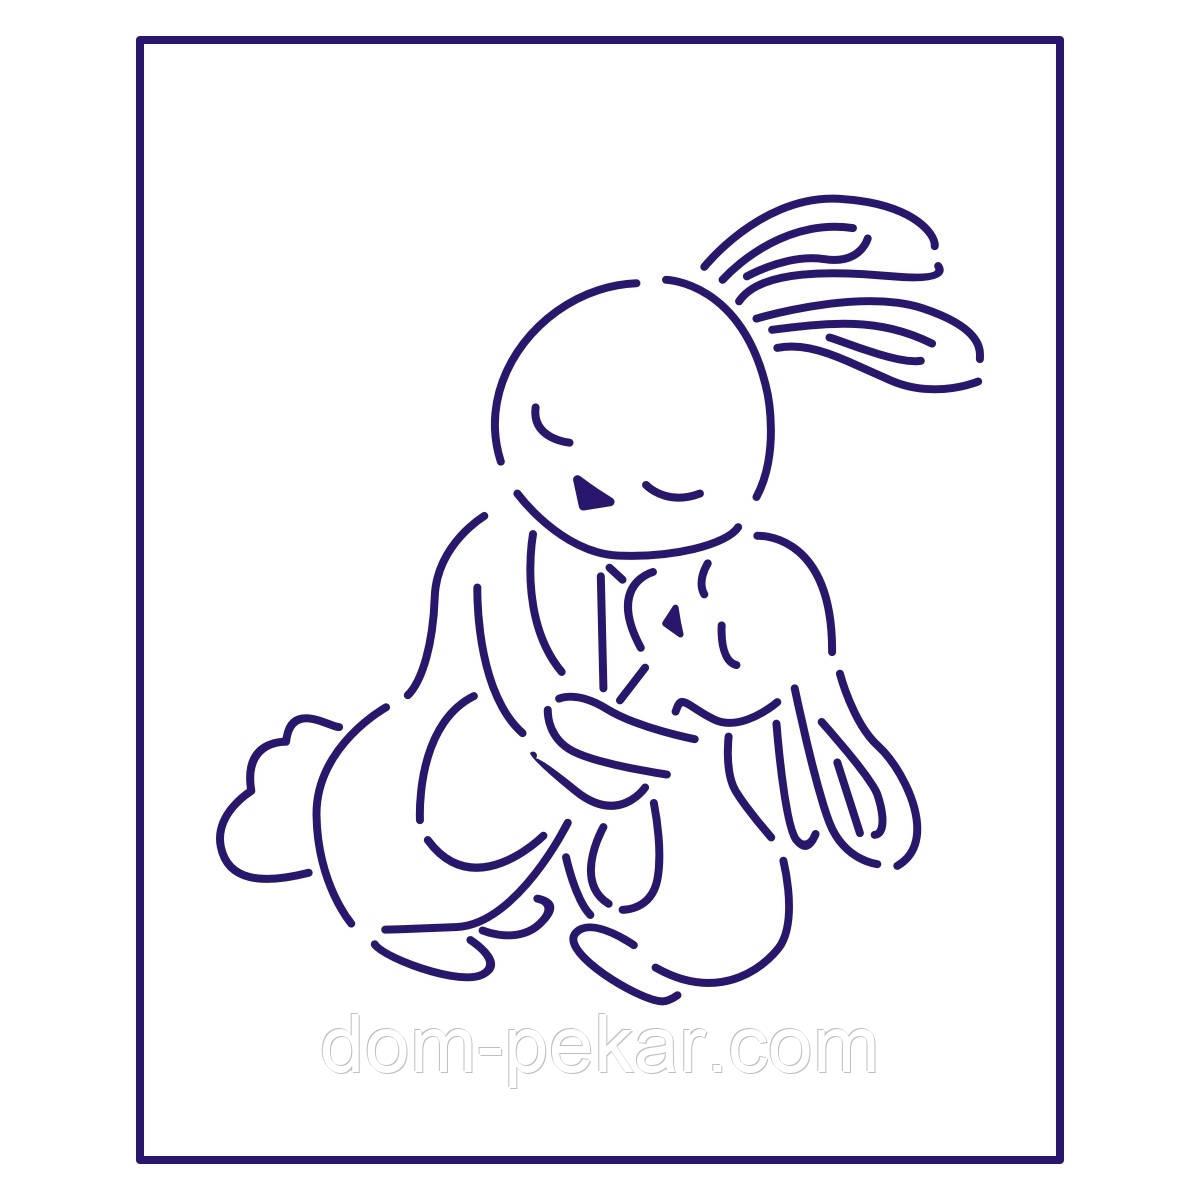 Трафарет Кролики-2 11,2*10,3 см (TR-1)